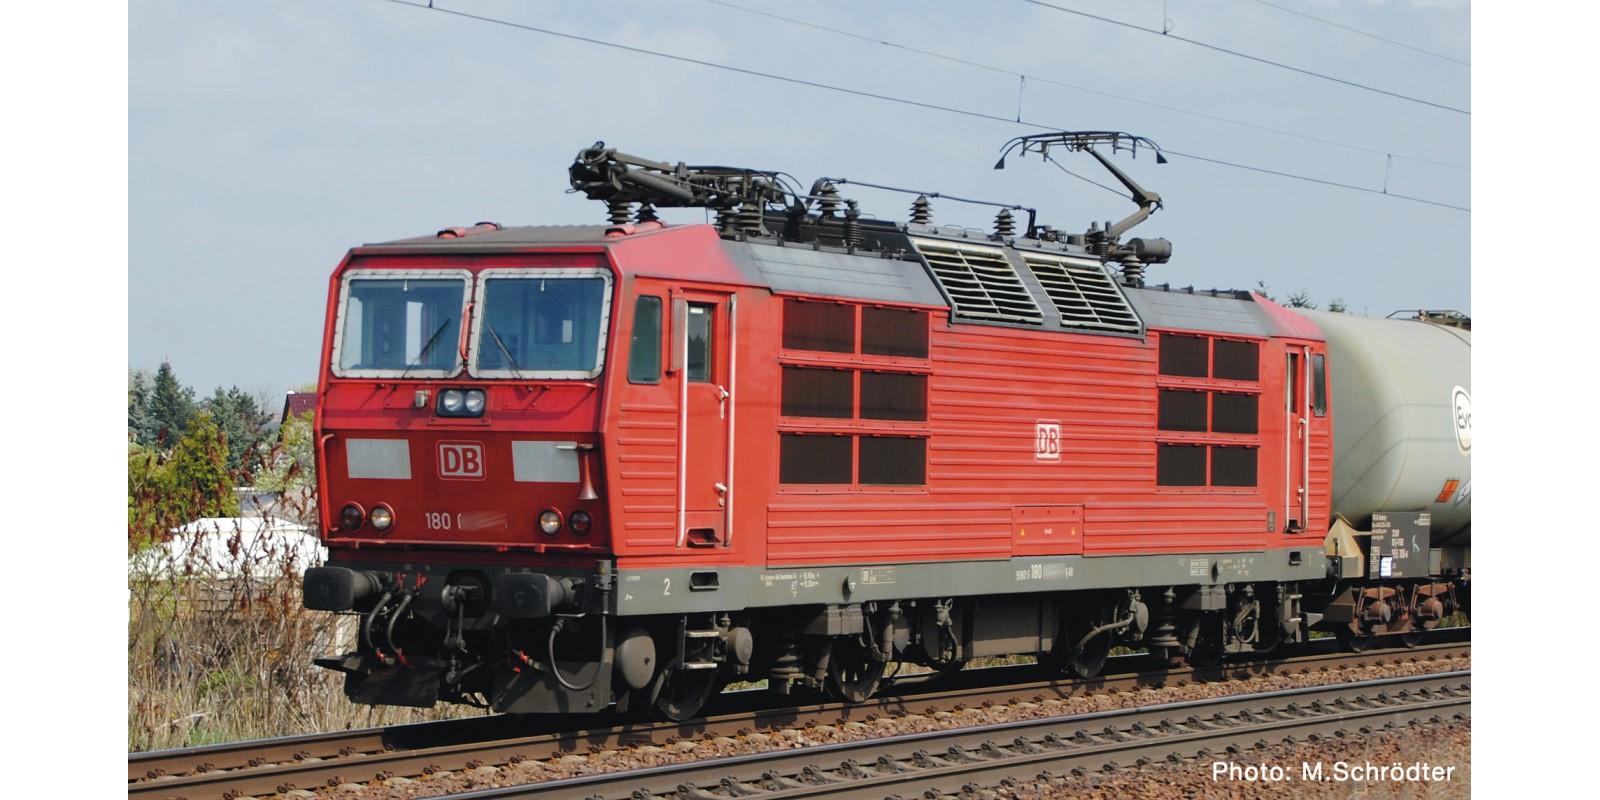 RO79224 Electric locomotive class 180